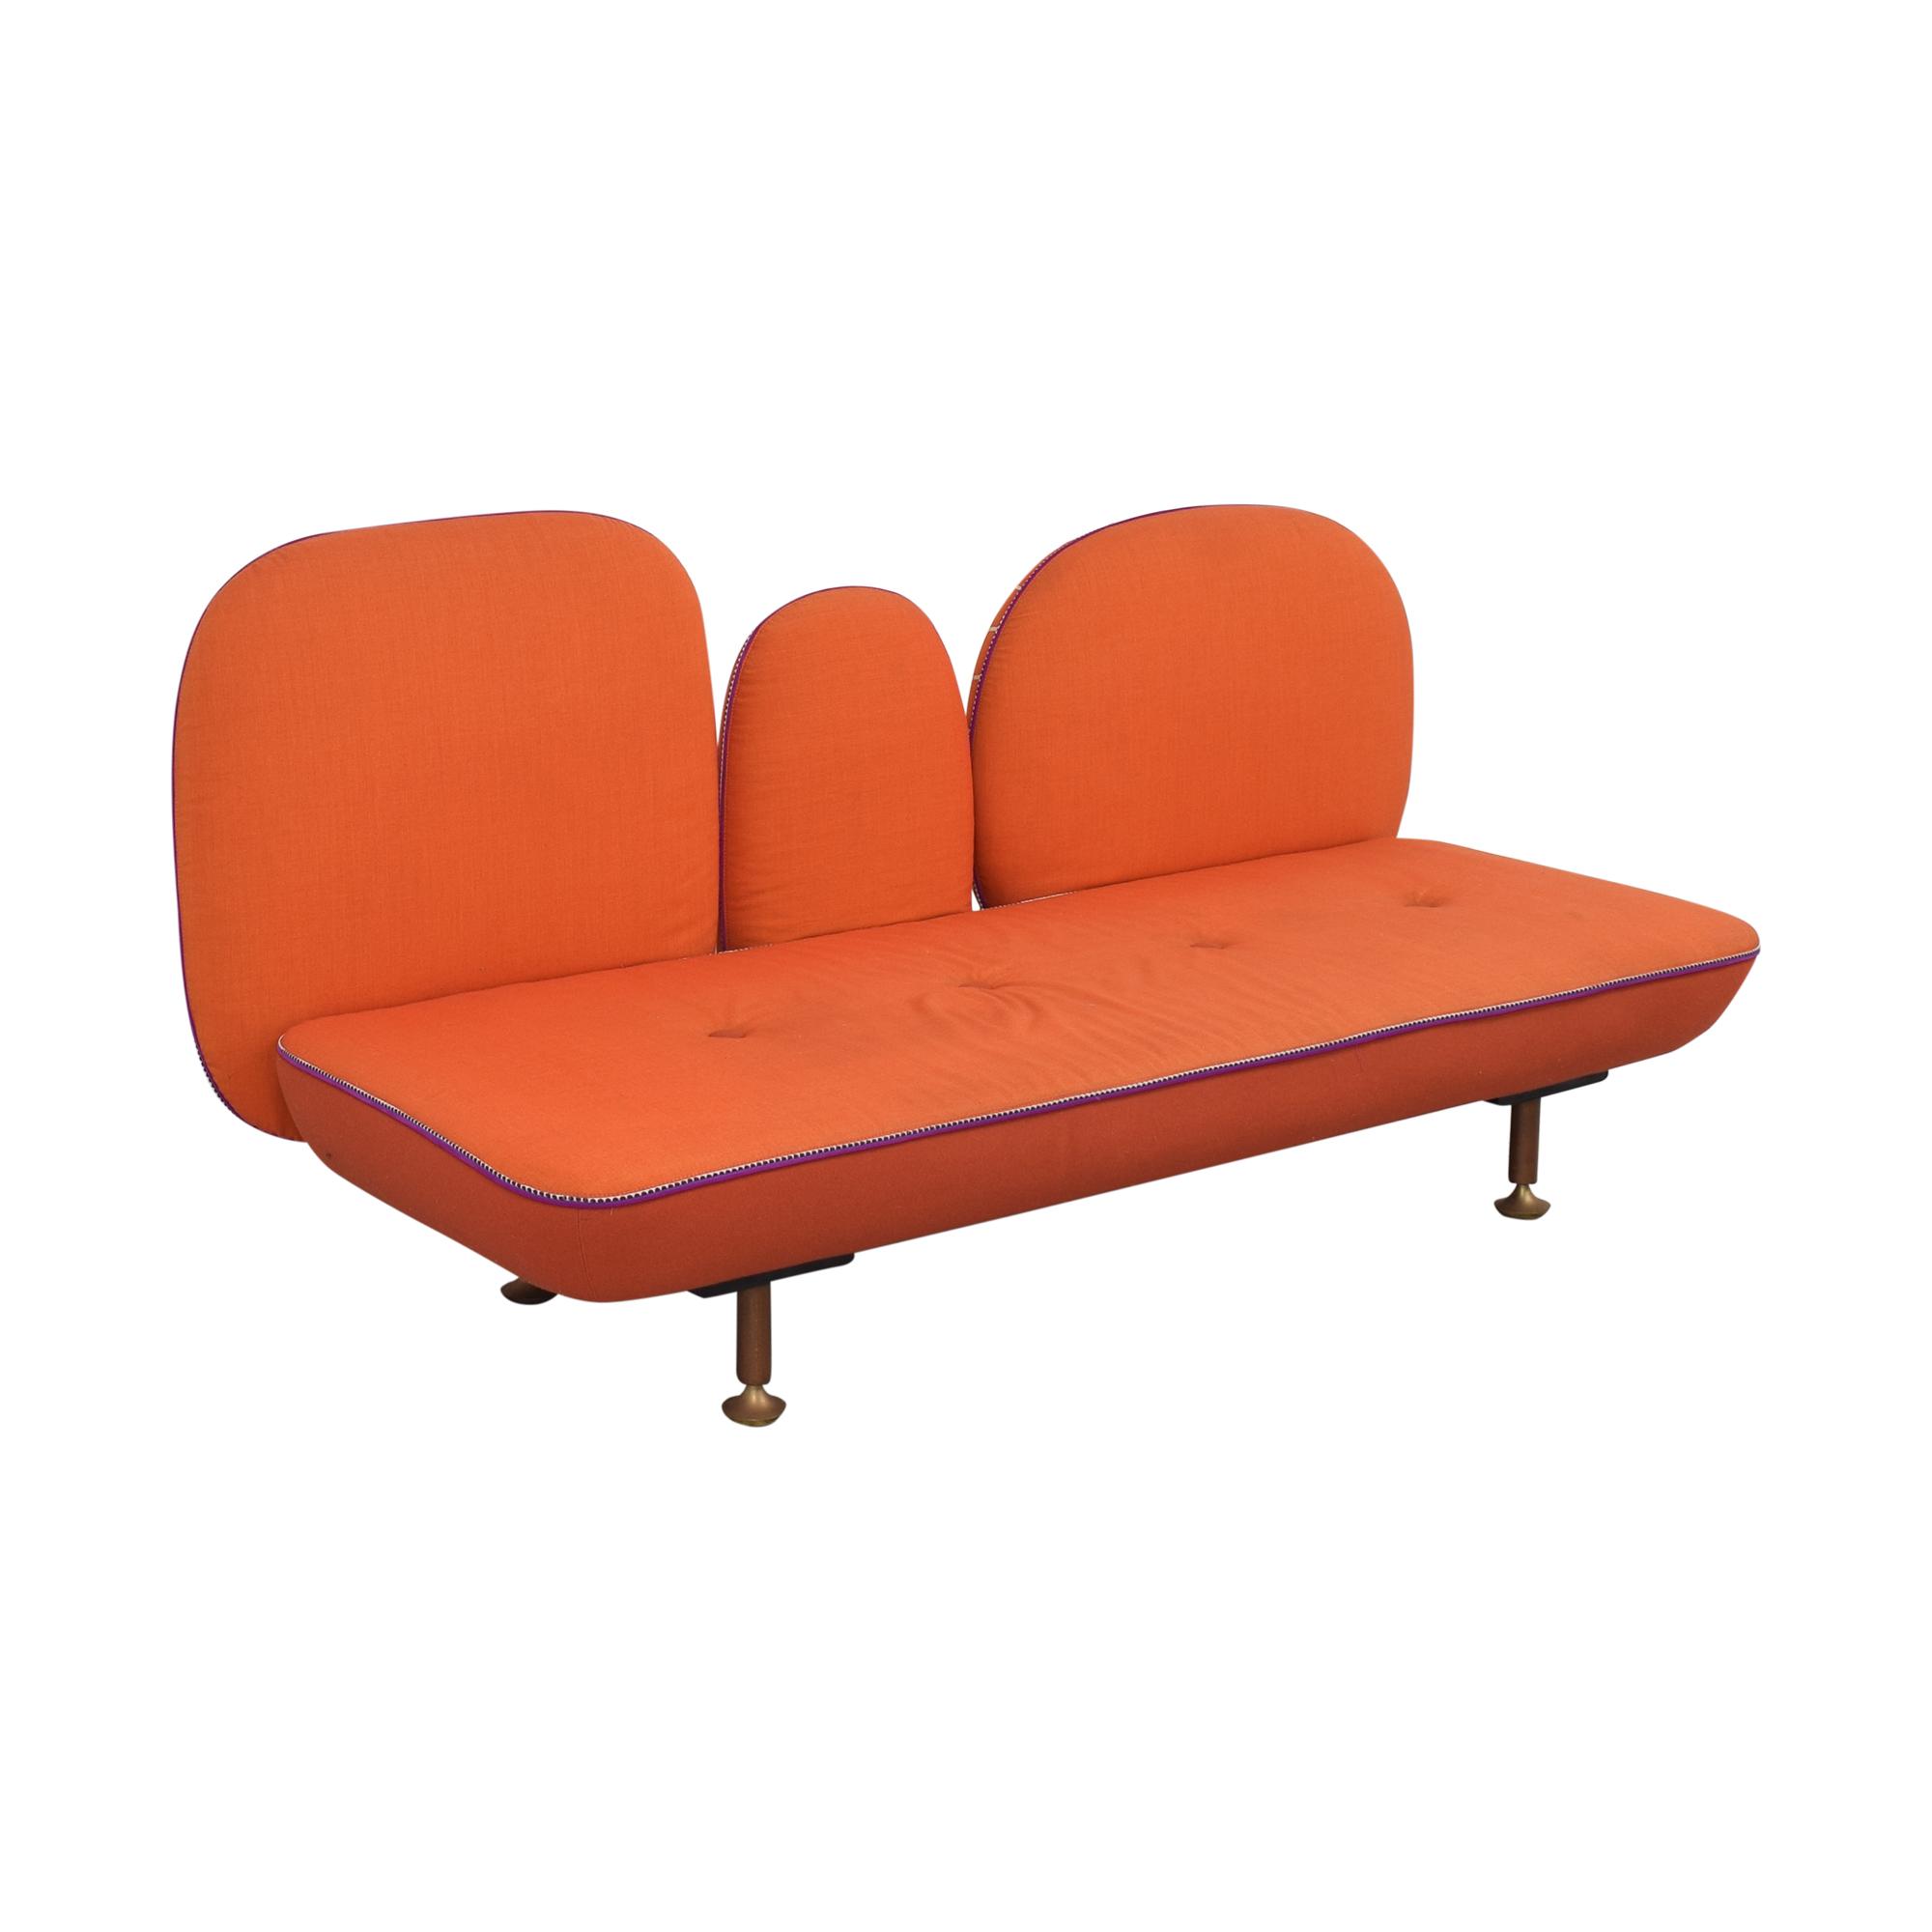 shop Moroso Moroso My Beautiful Backside Sofa online